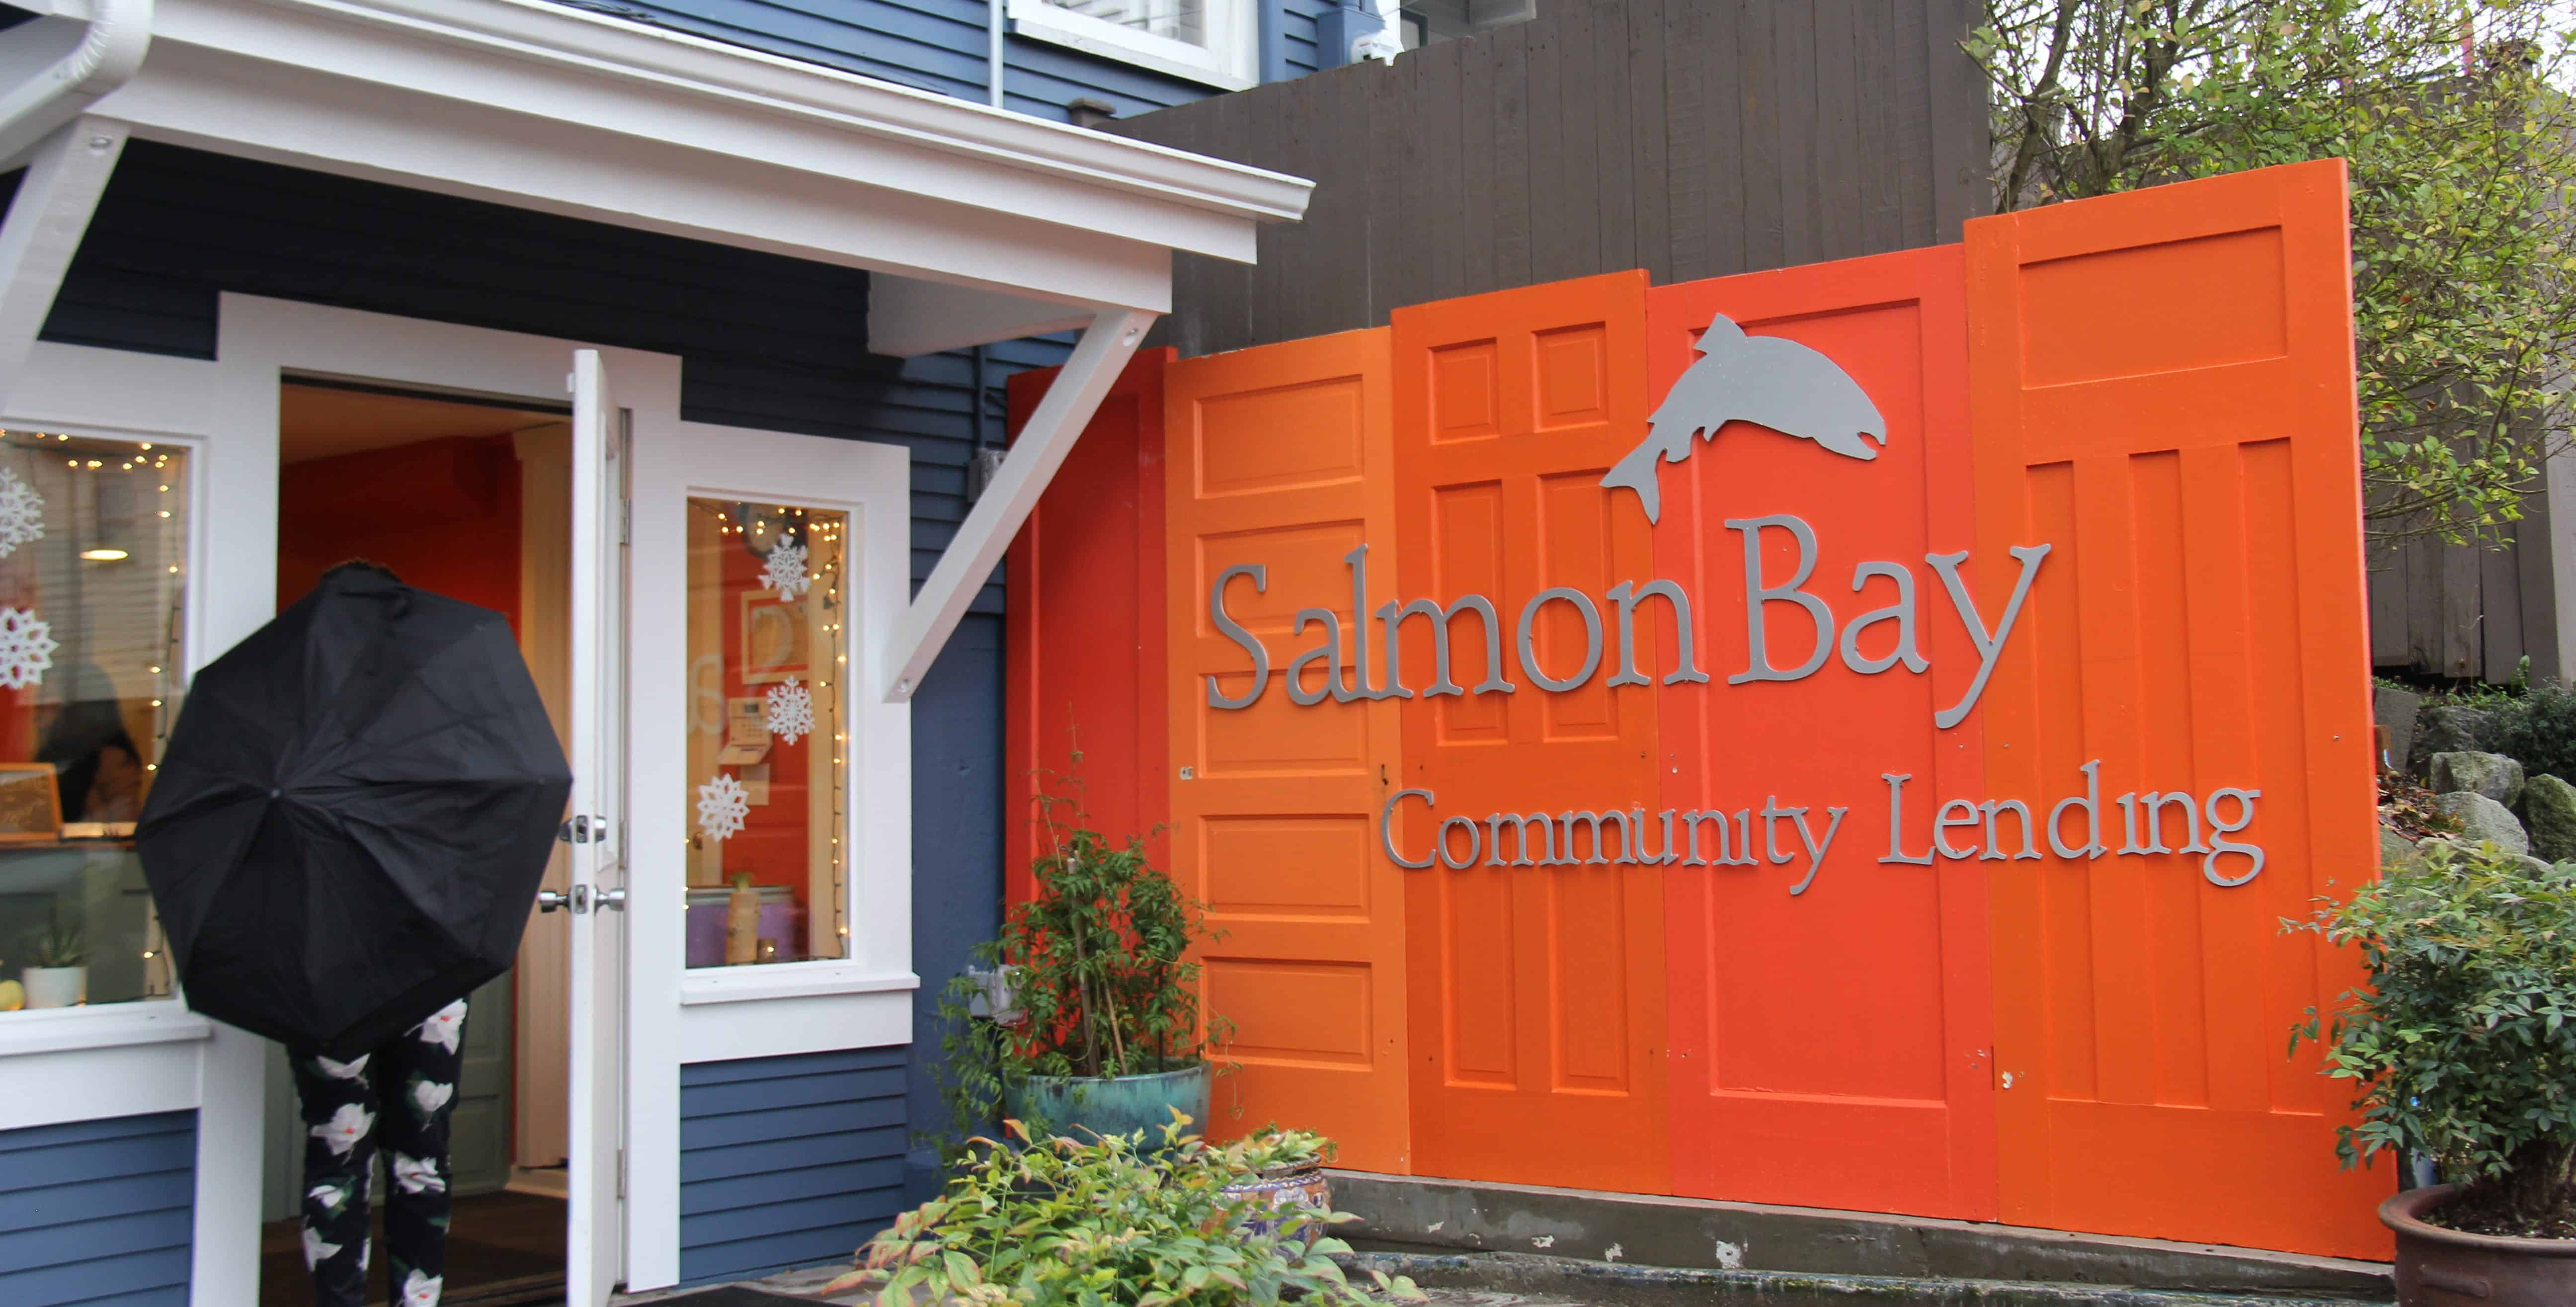 Great Home Loans Rain or Shine